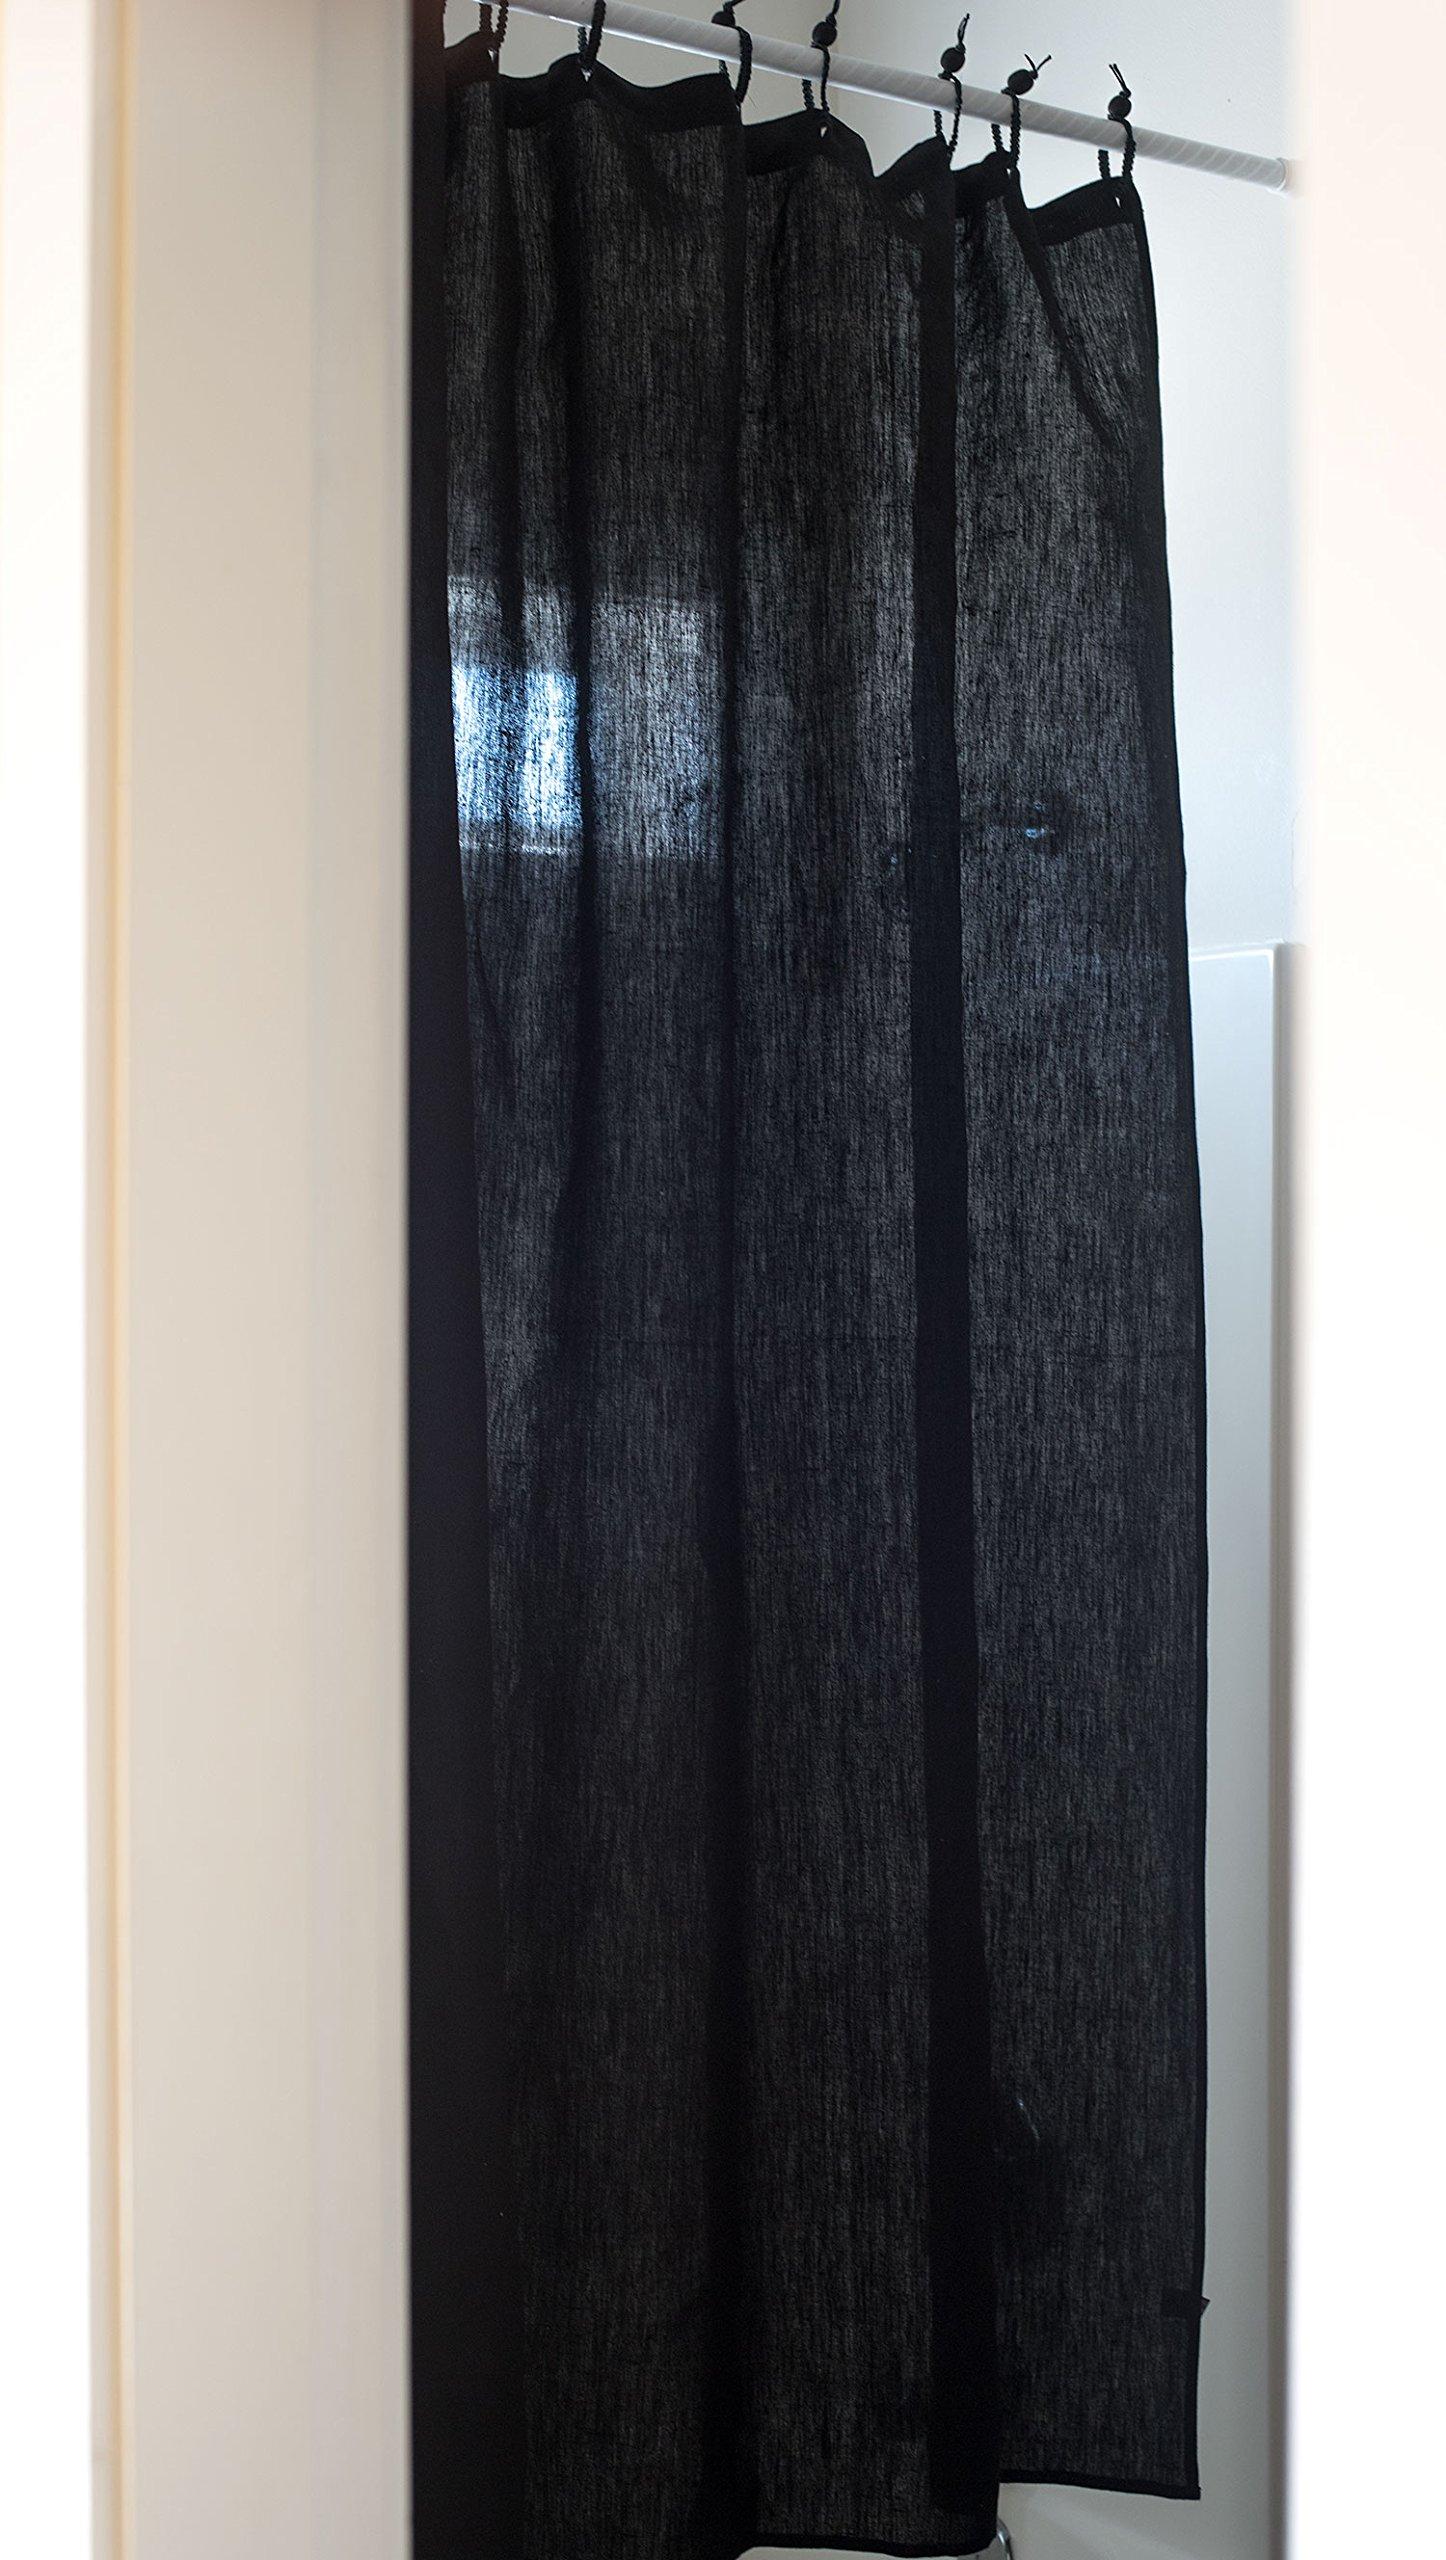 Organic Hemp Shower Curtain Full Size (73.5''x72'') - Black